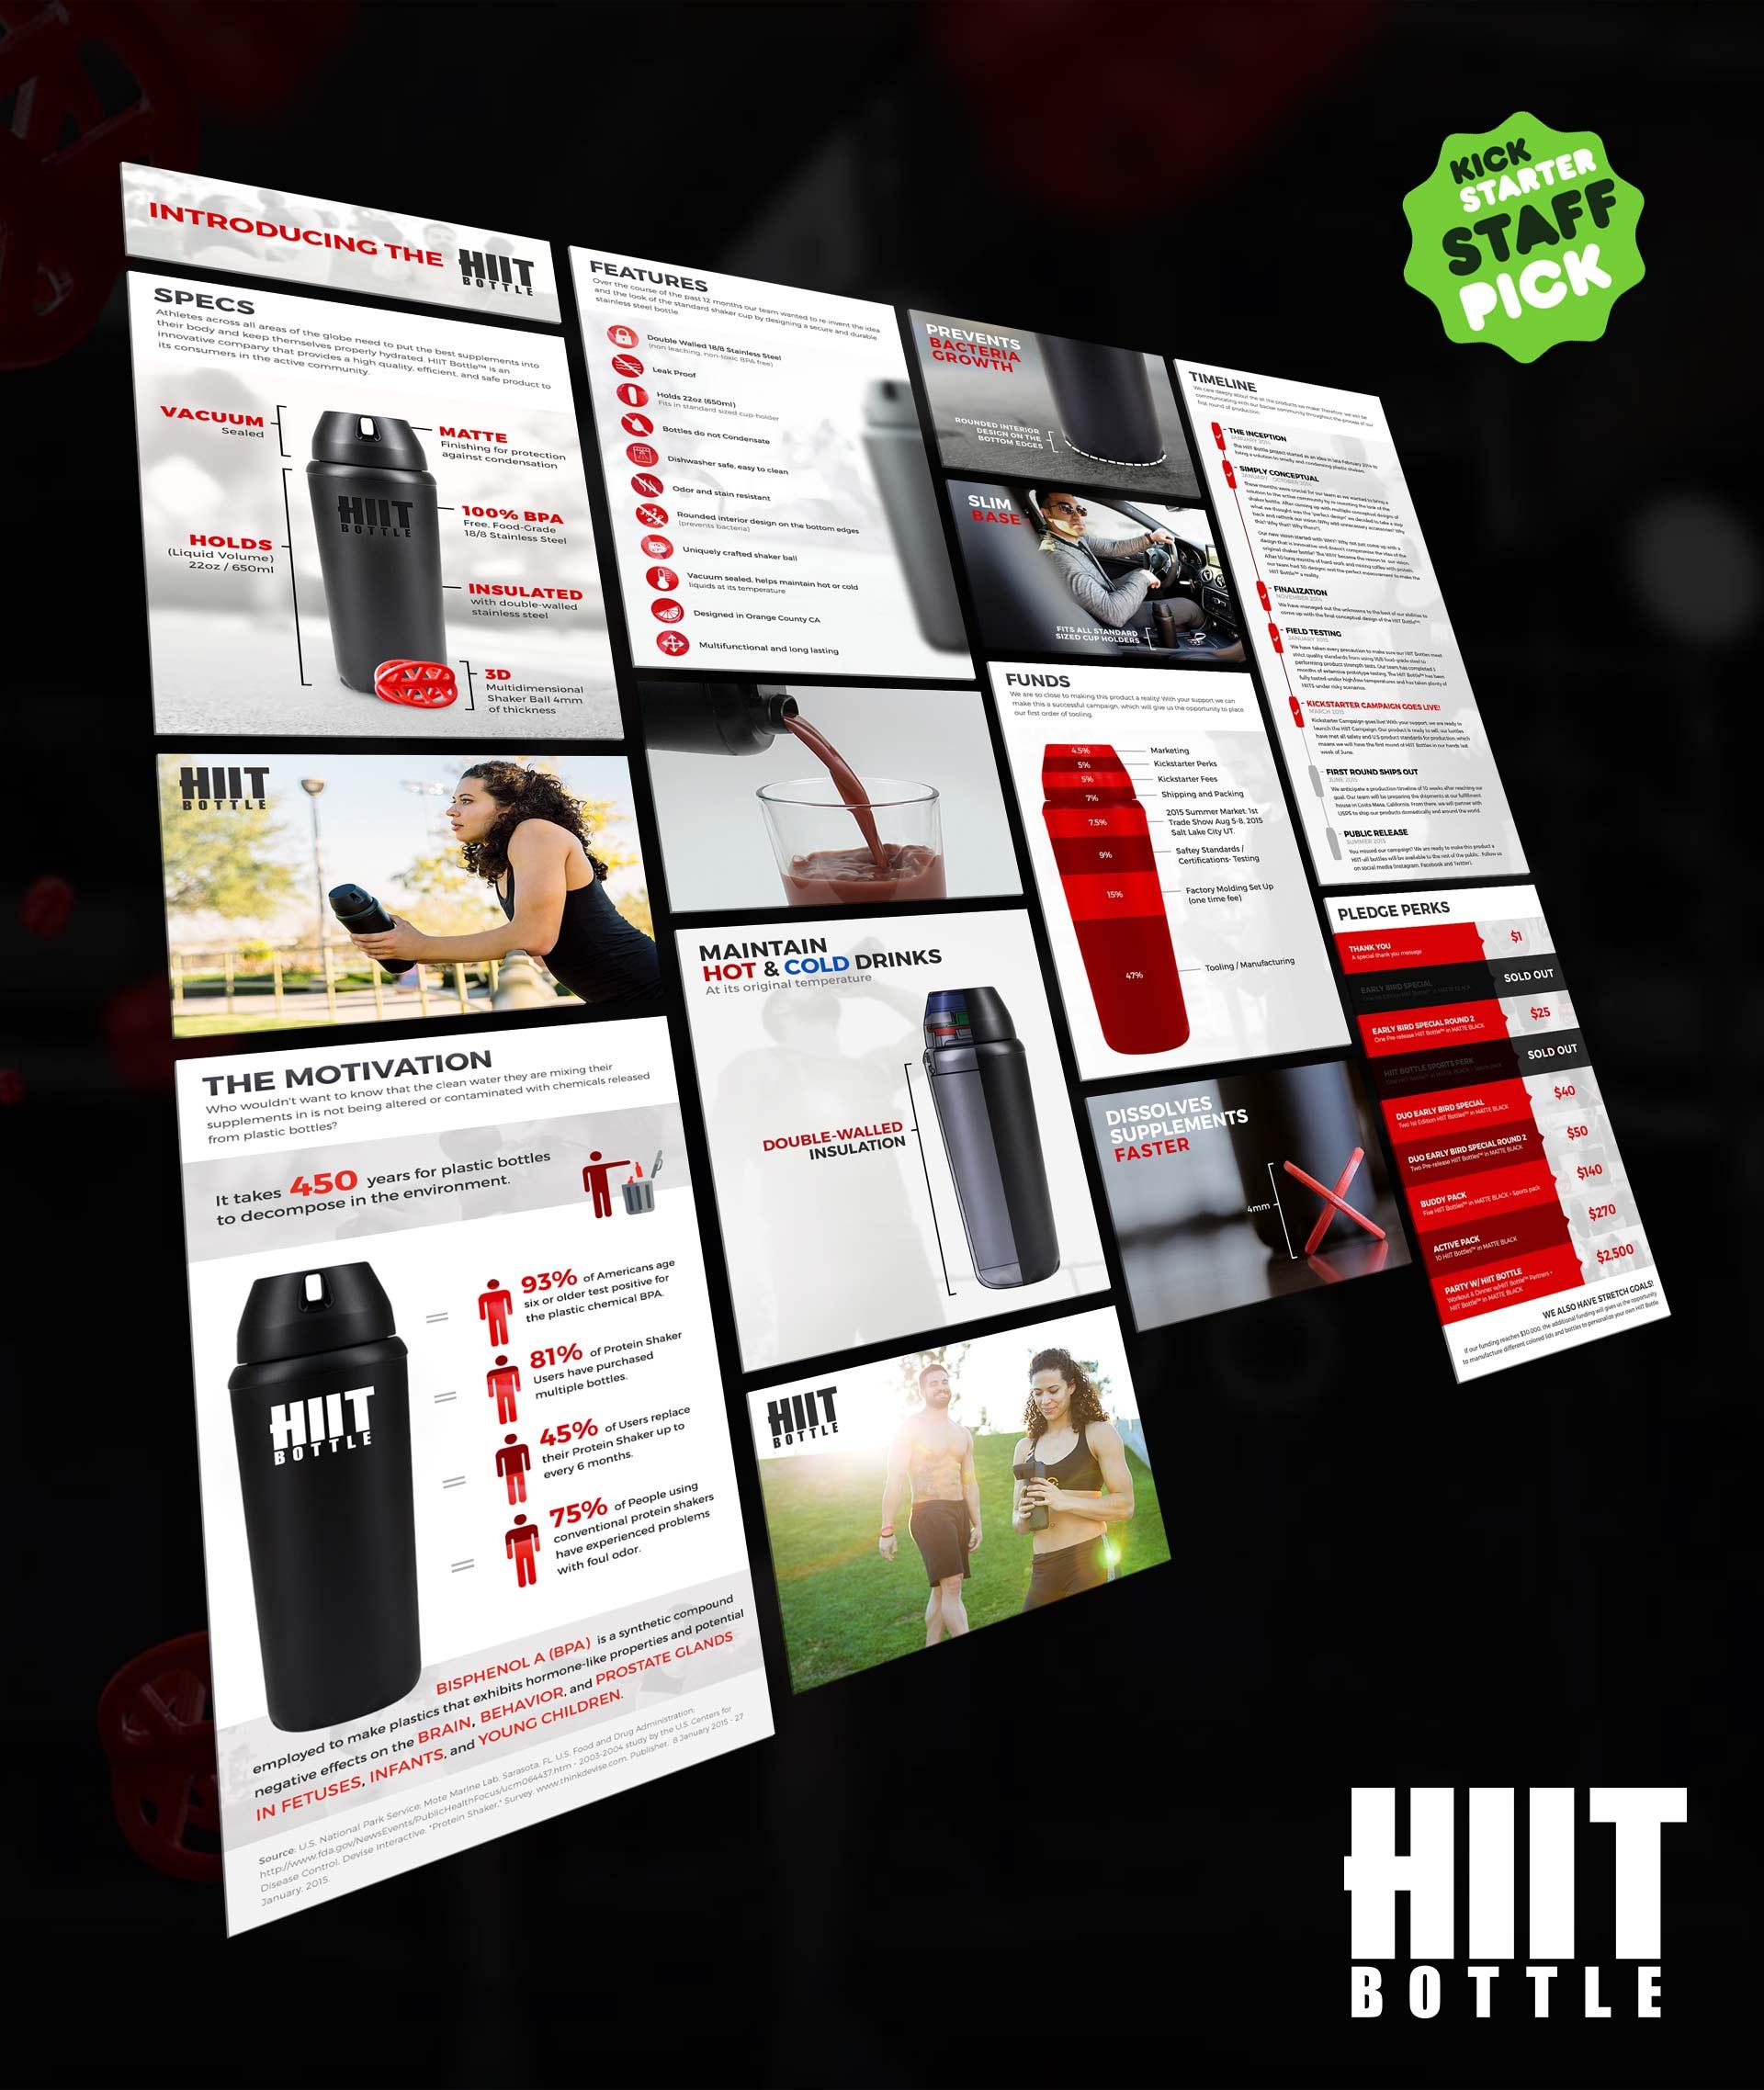 HIIT Bottle Kickstarter Campaign